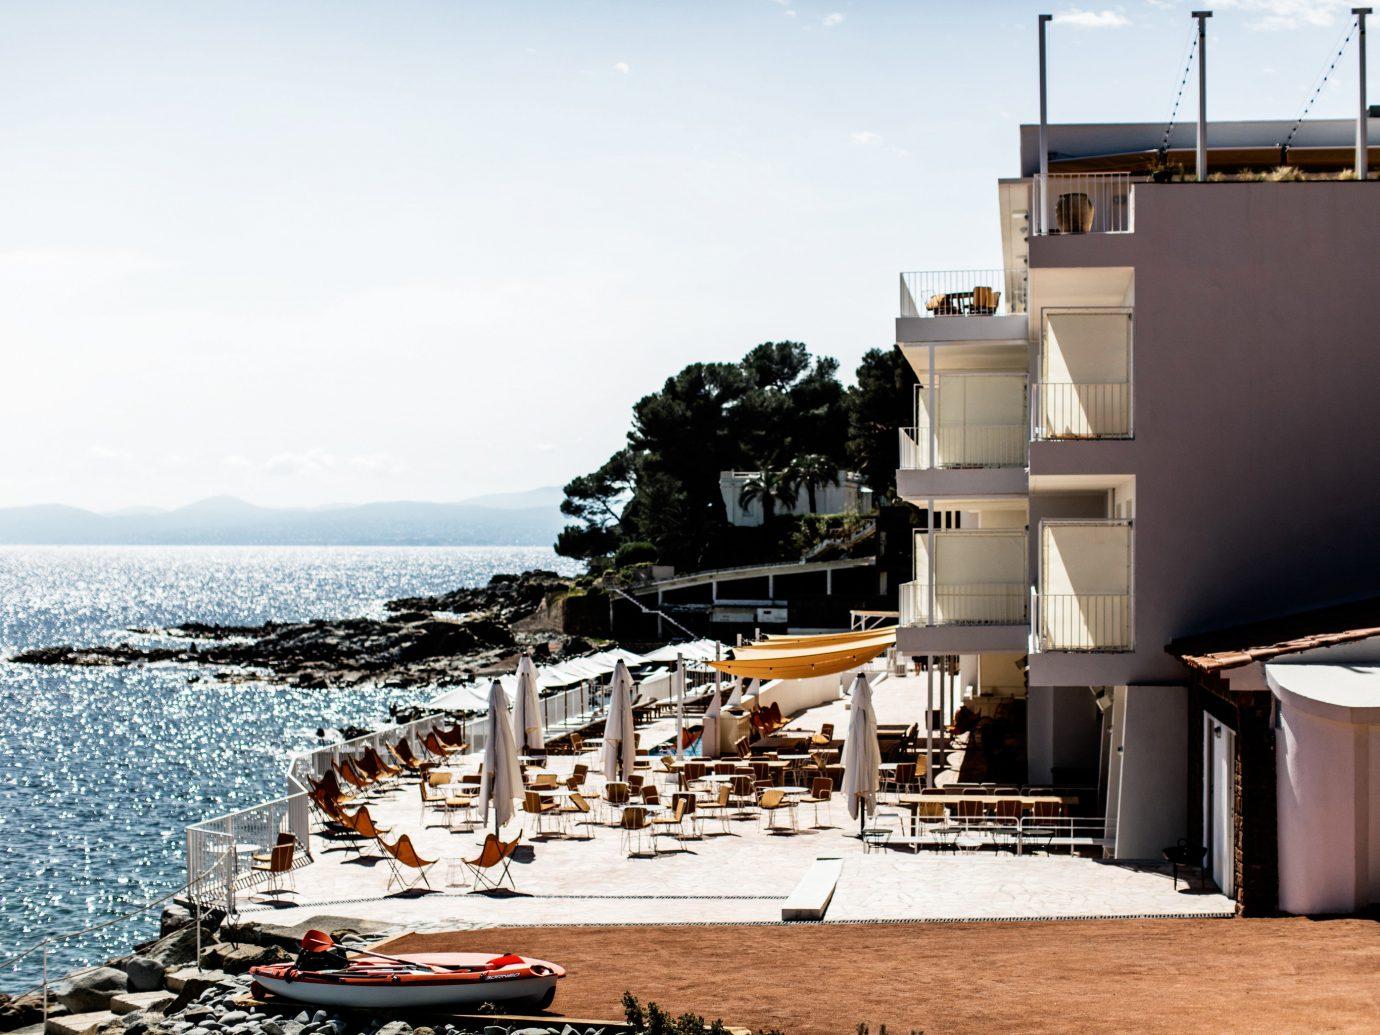 Hotels sky outdoor Sea water vacation